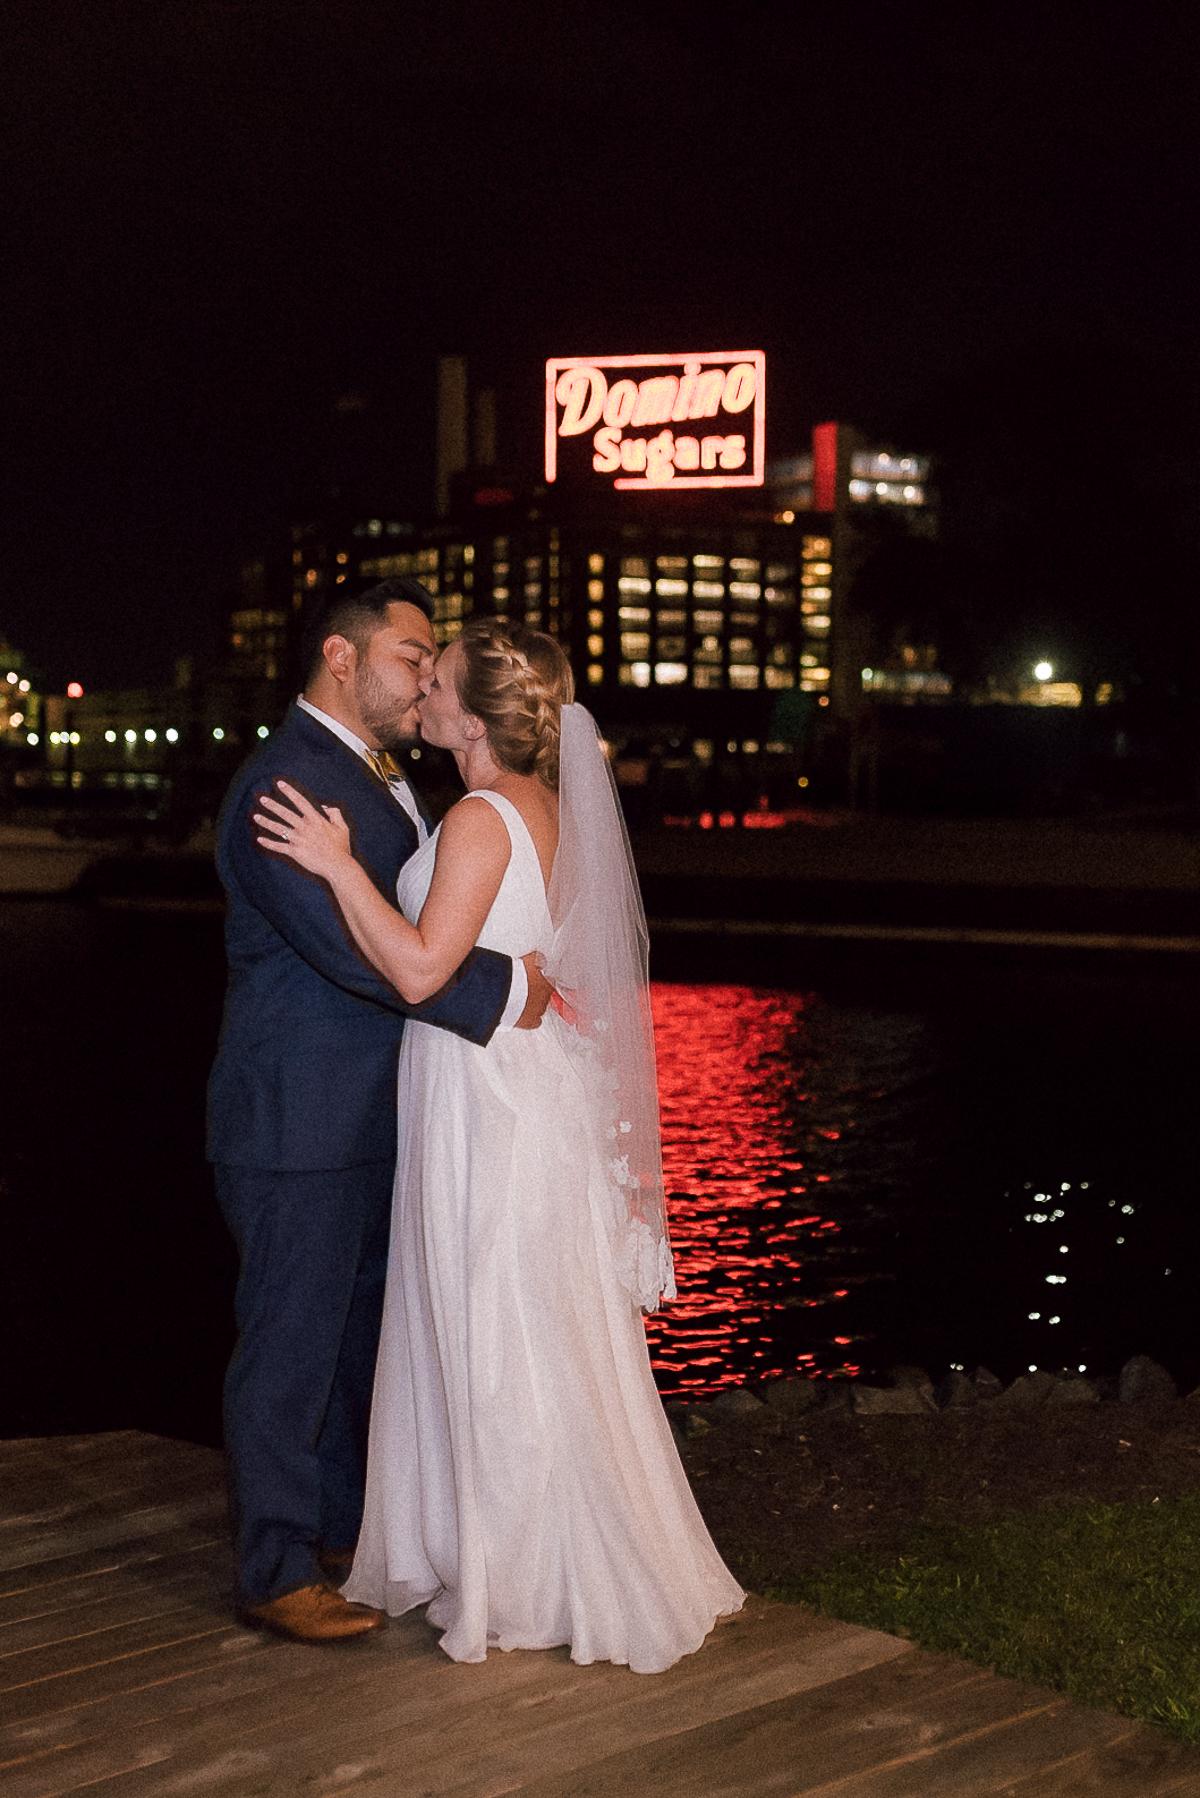 MD-Baltimore-Wedding-Museum-of-Industry-Fall-Wedding-inner-Harbor-34.jpg